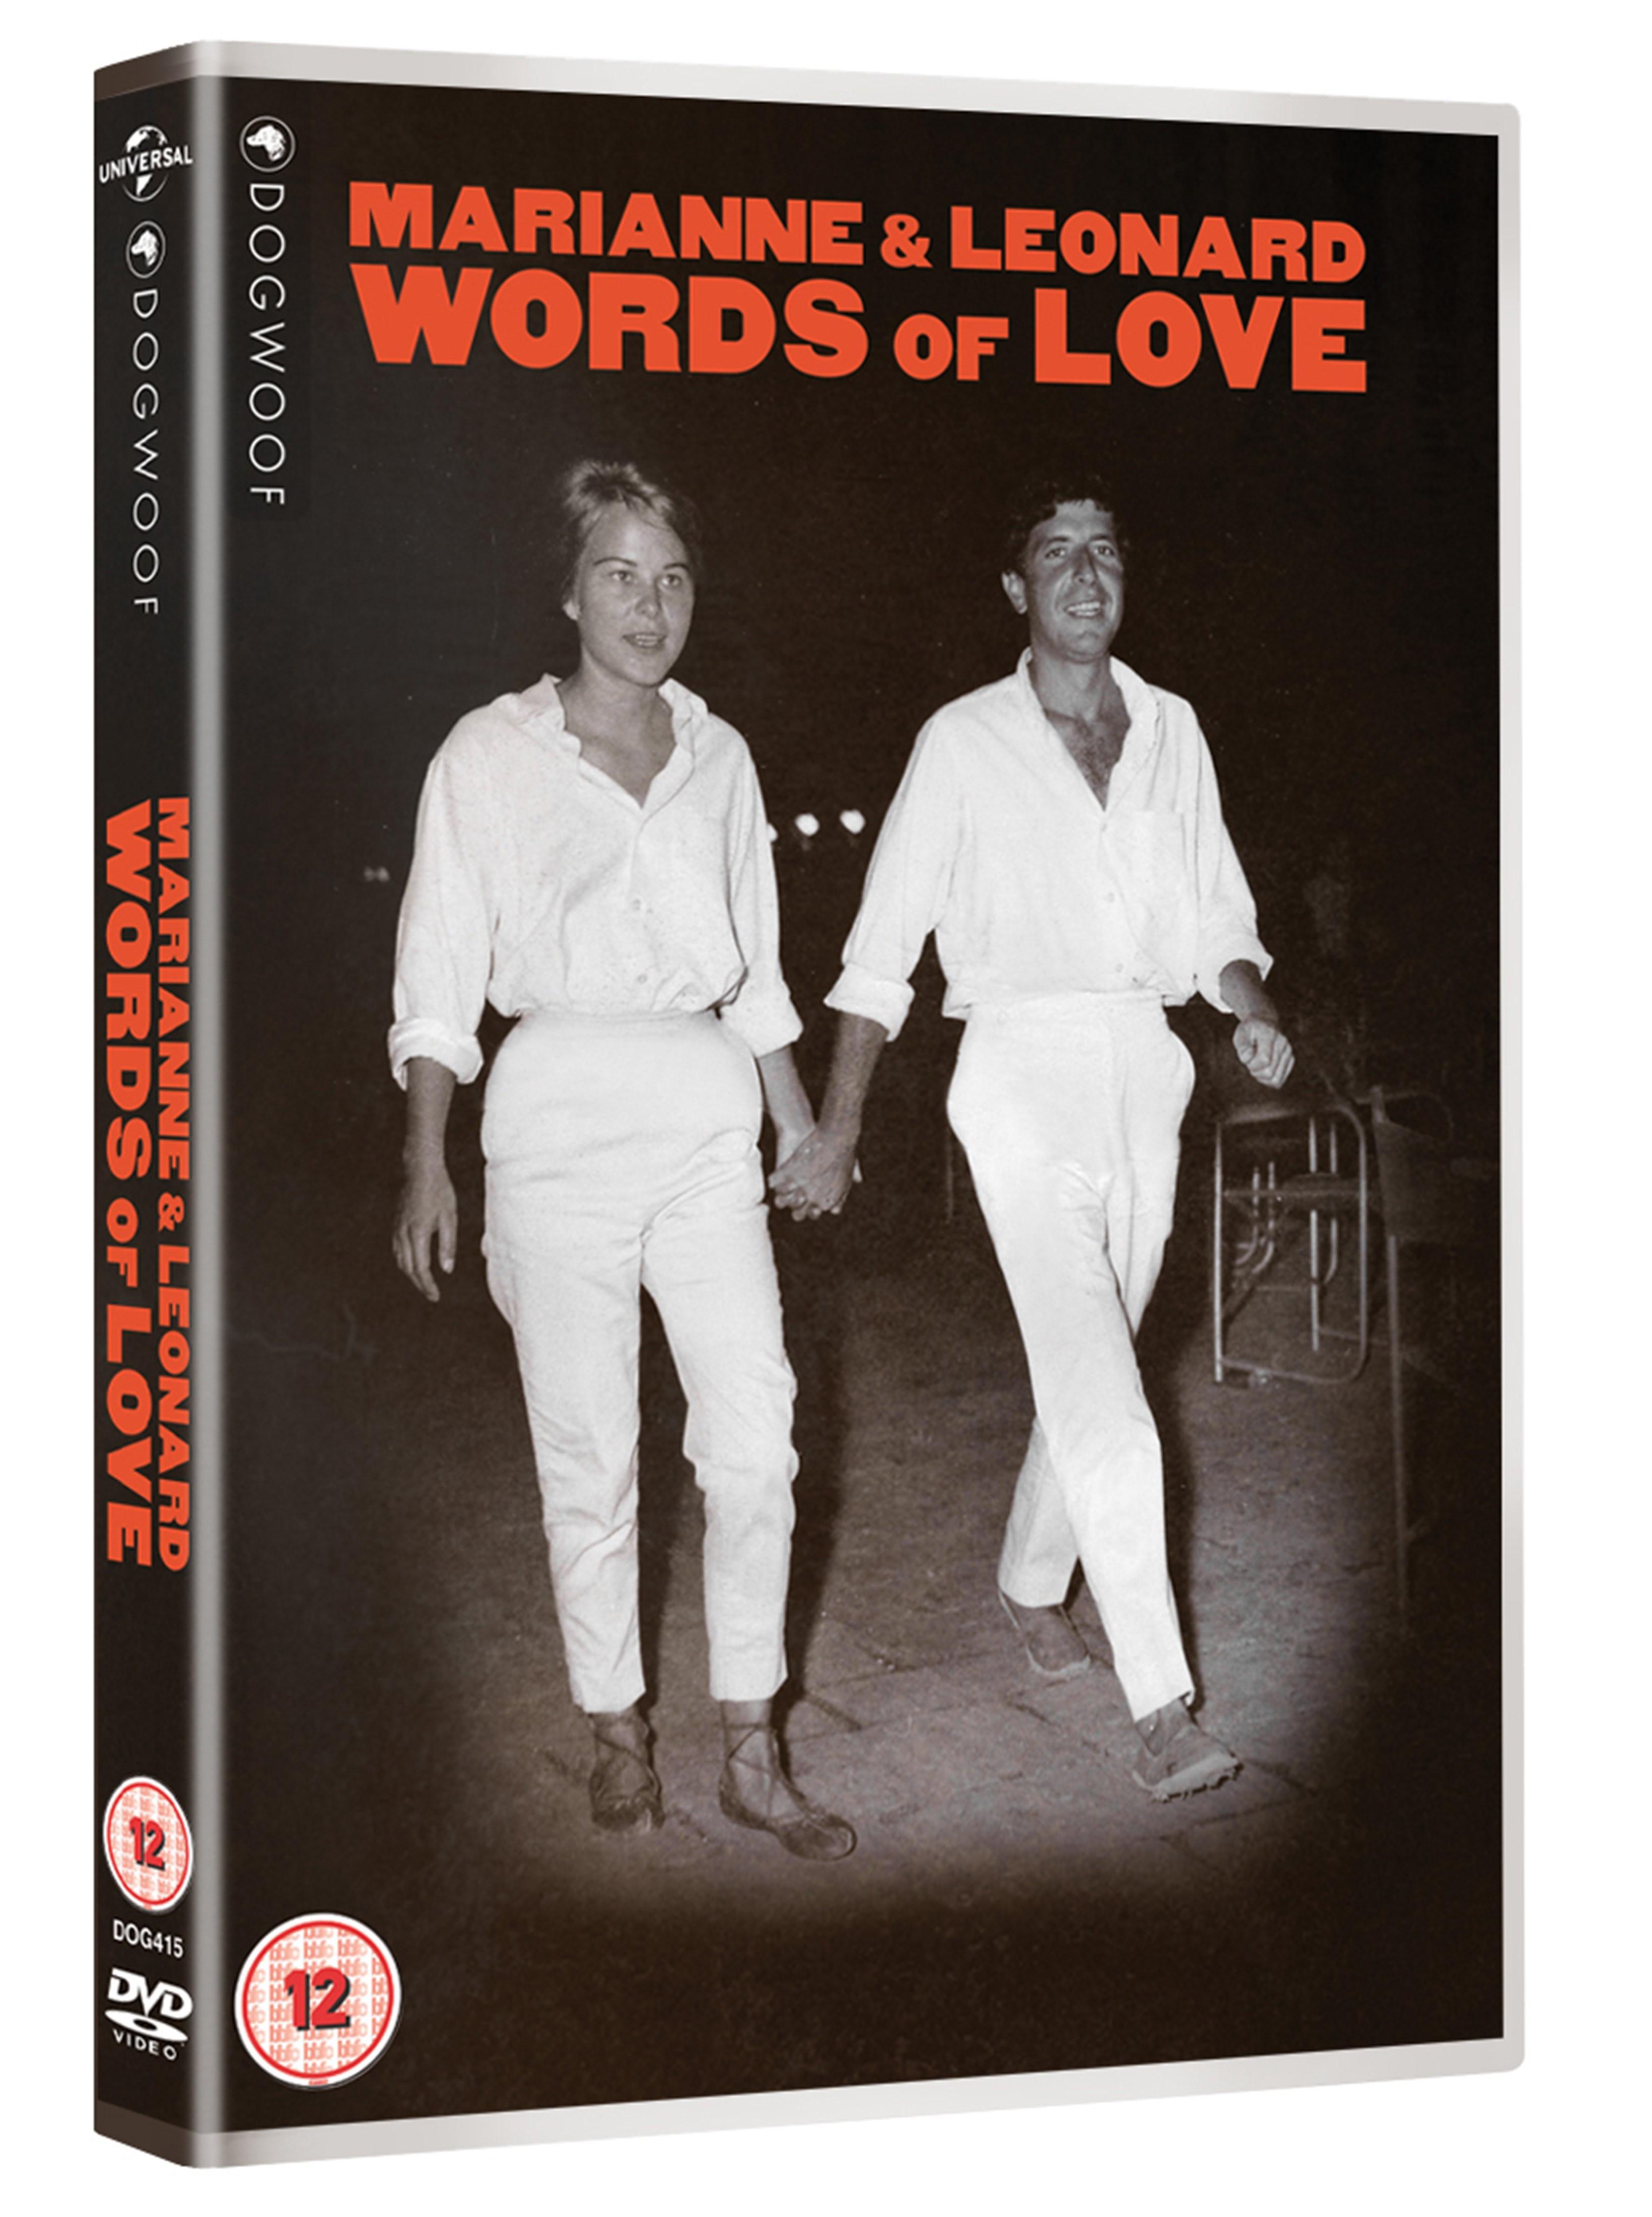 Marianne & Leonard - Words of Love - 2